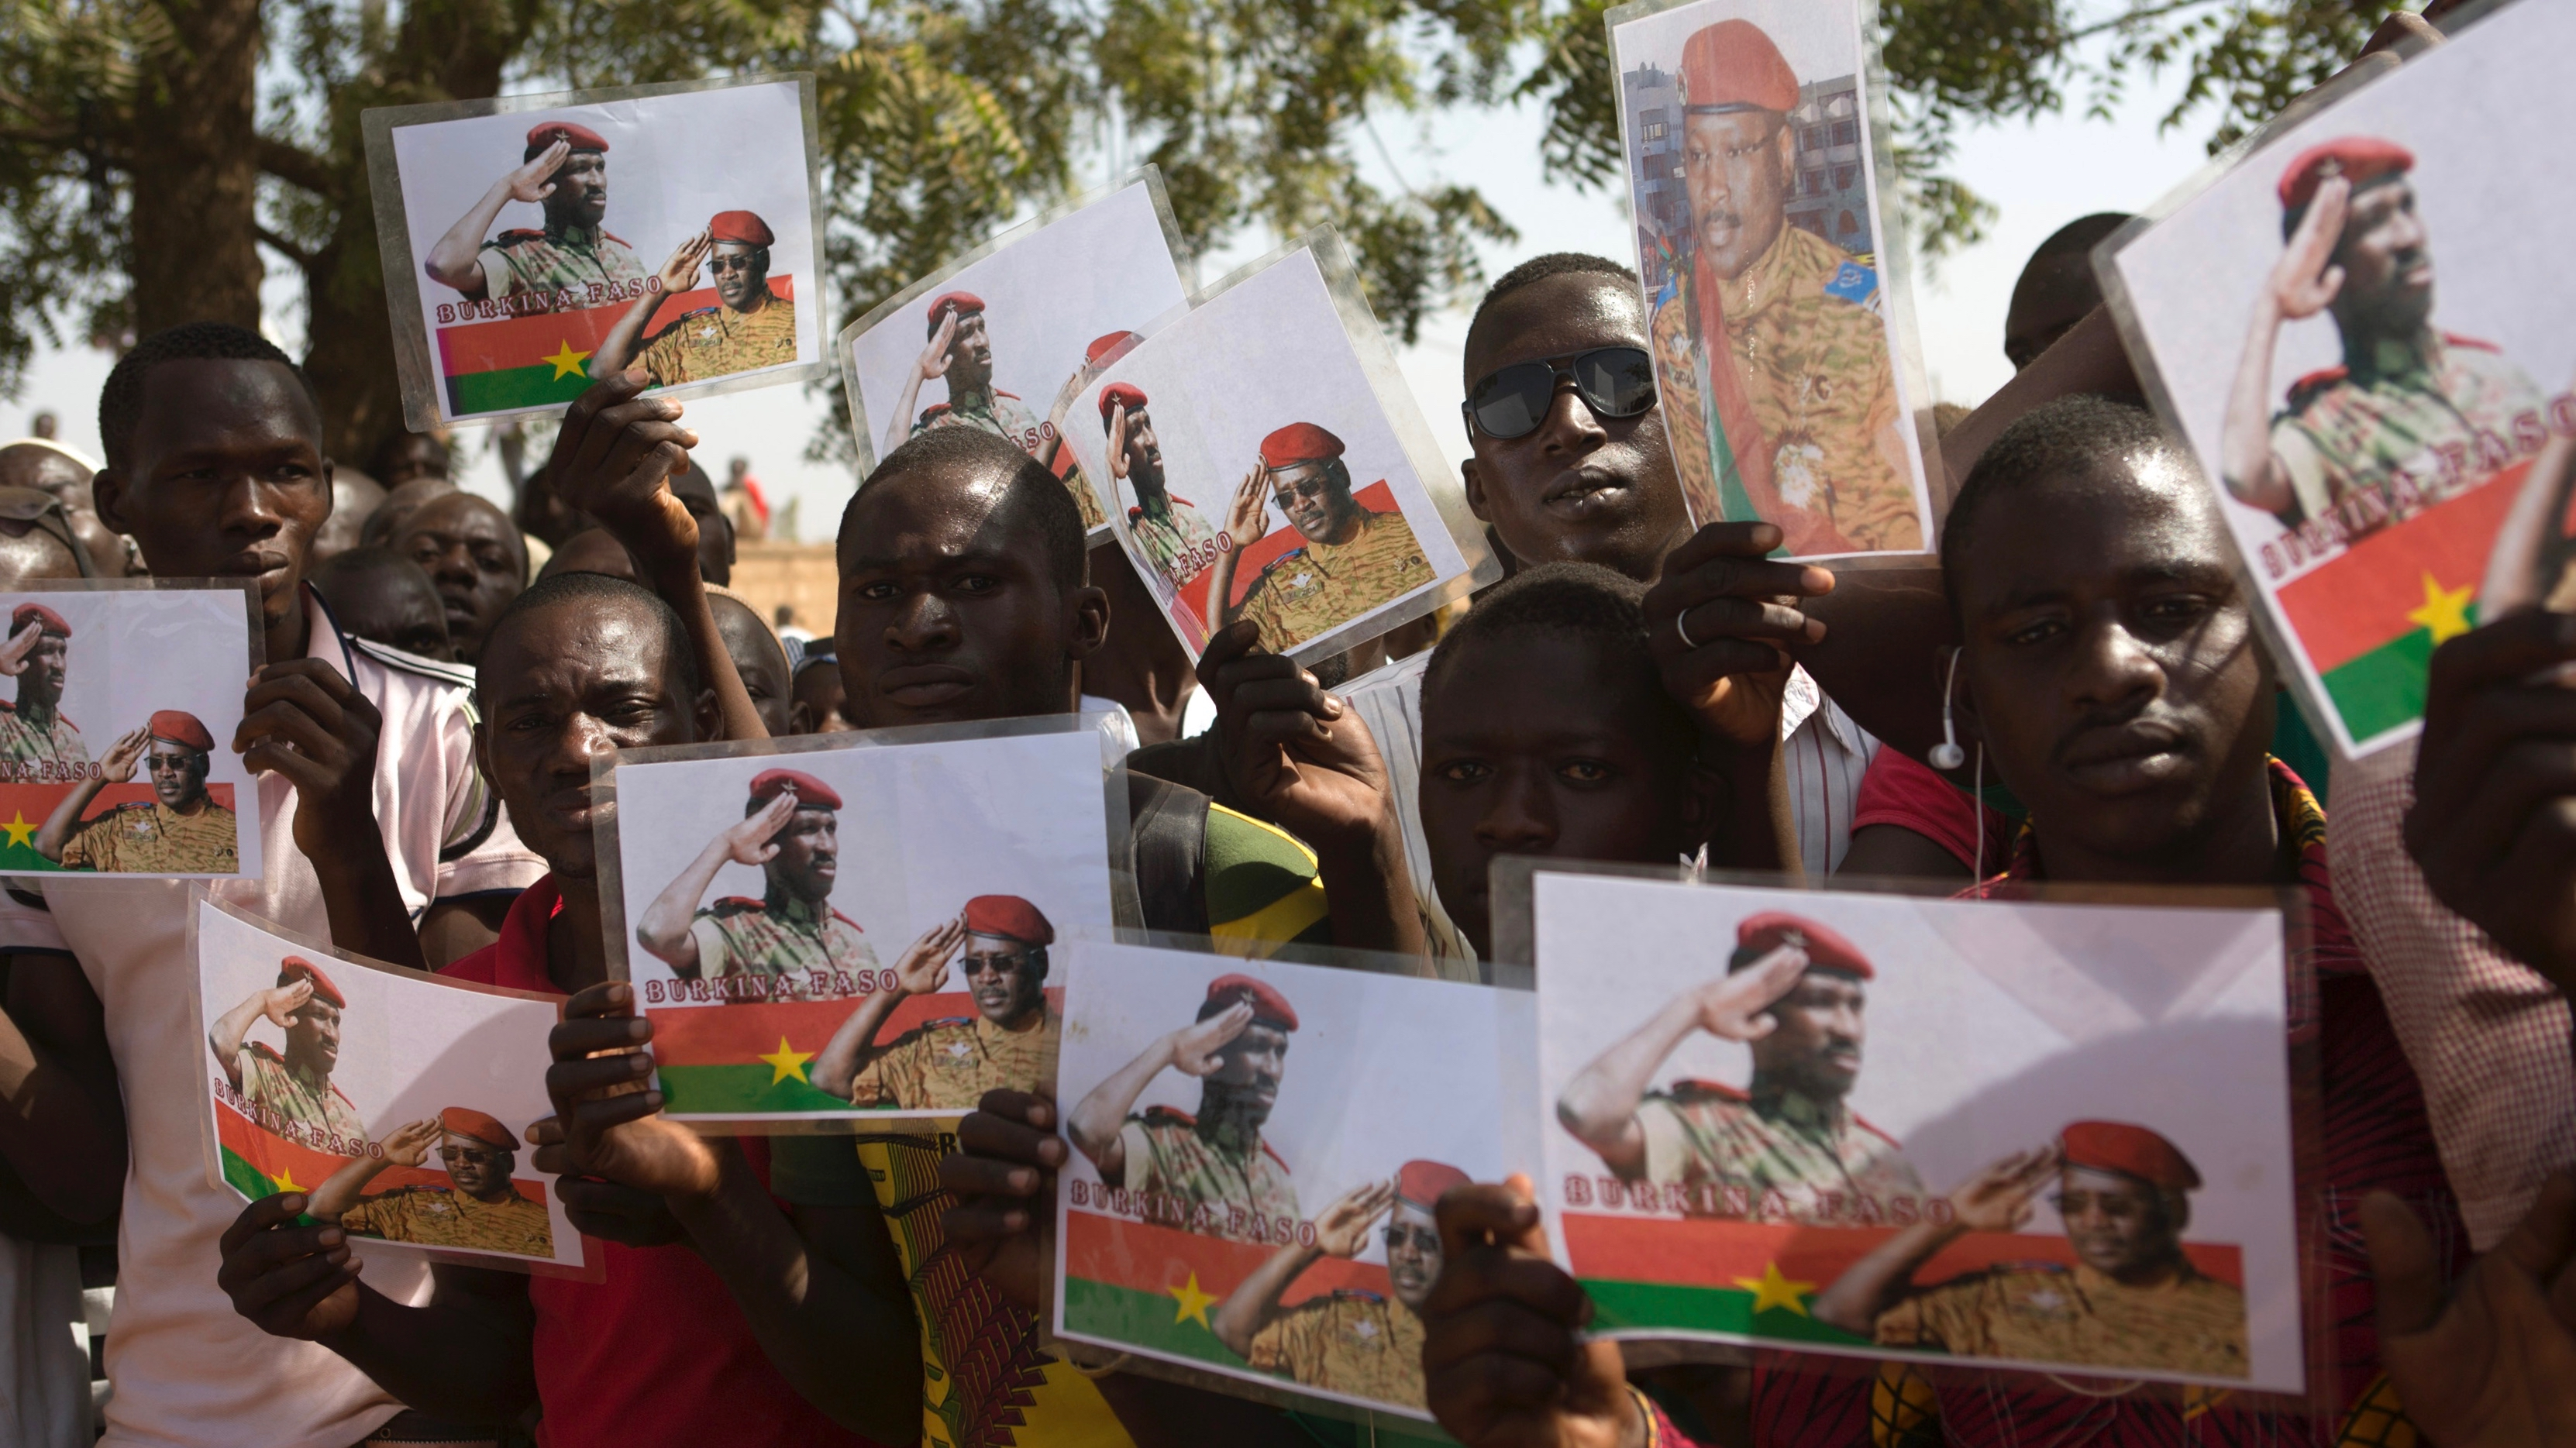 Thomas Sankara statue unveiled in Burkina Faso